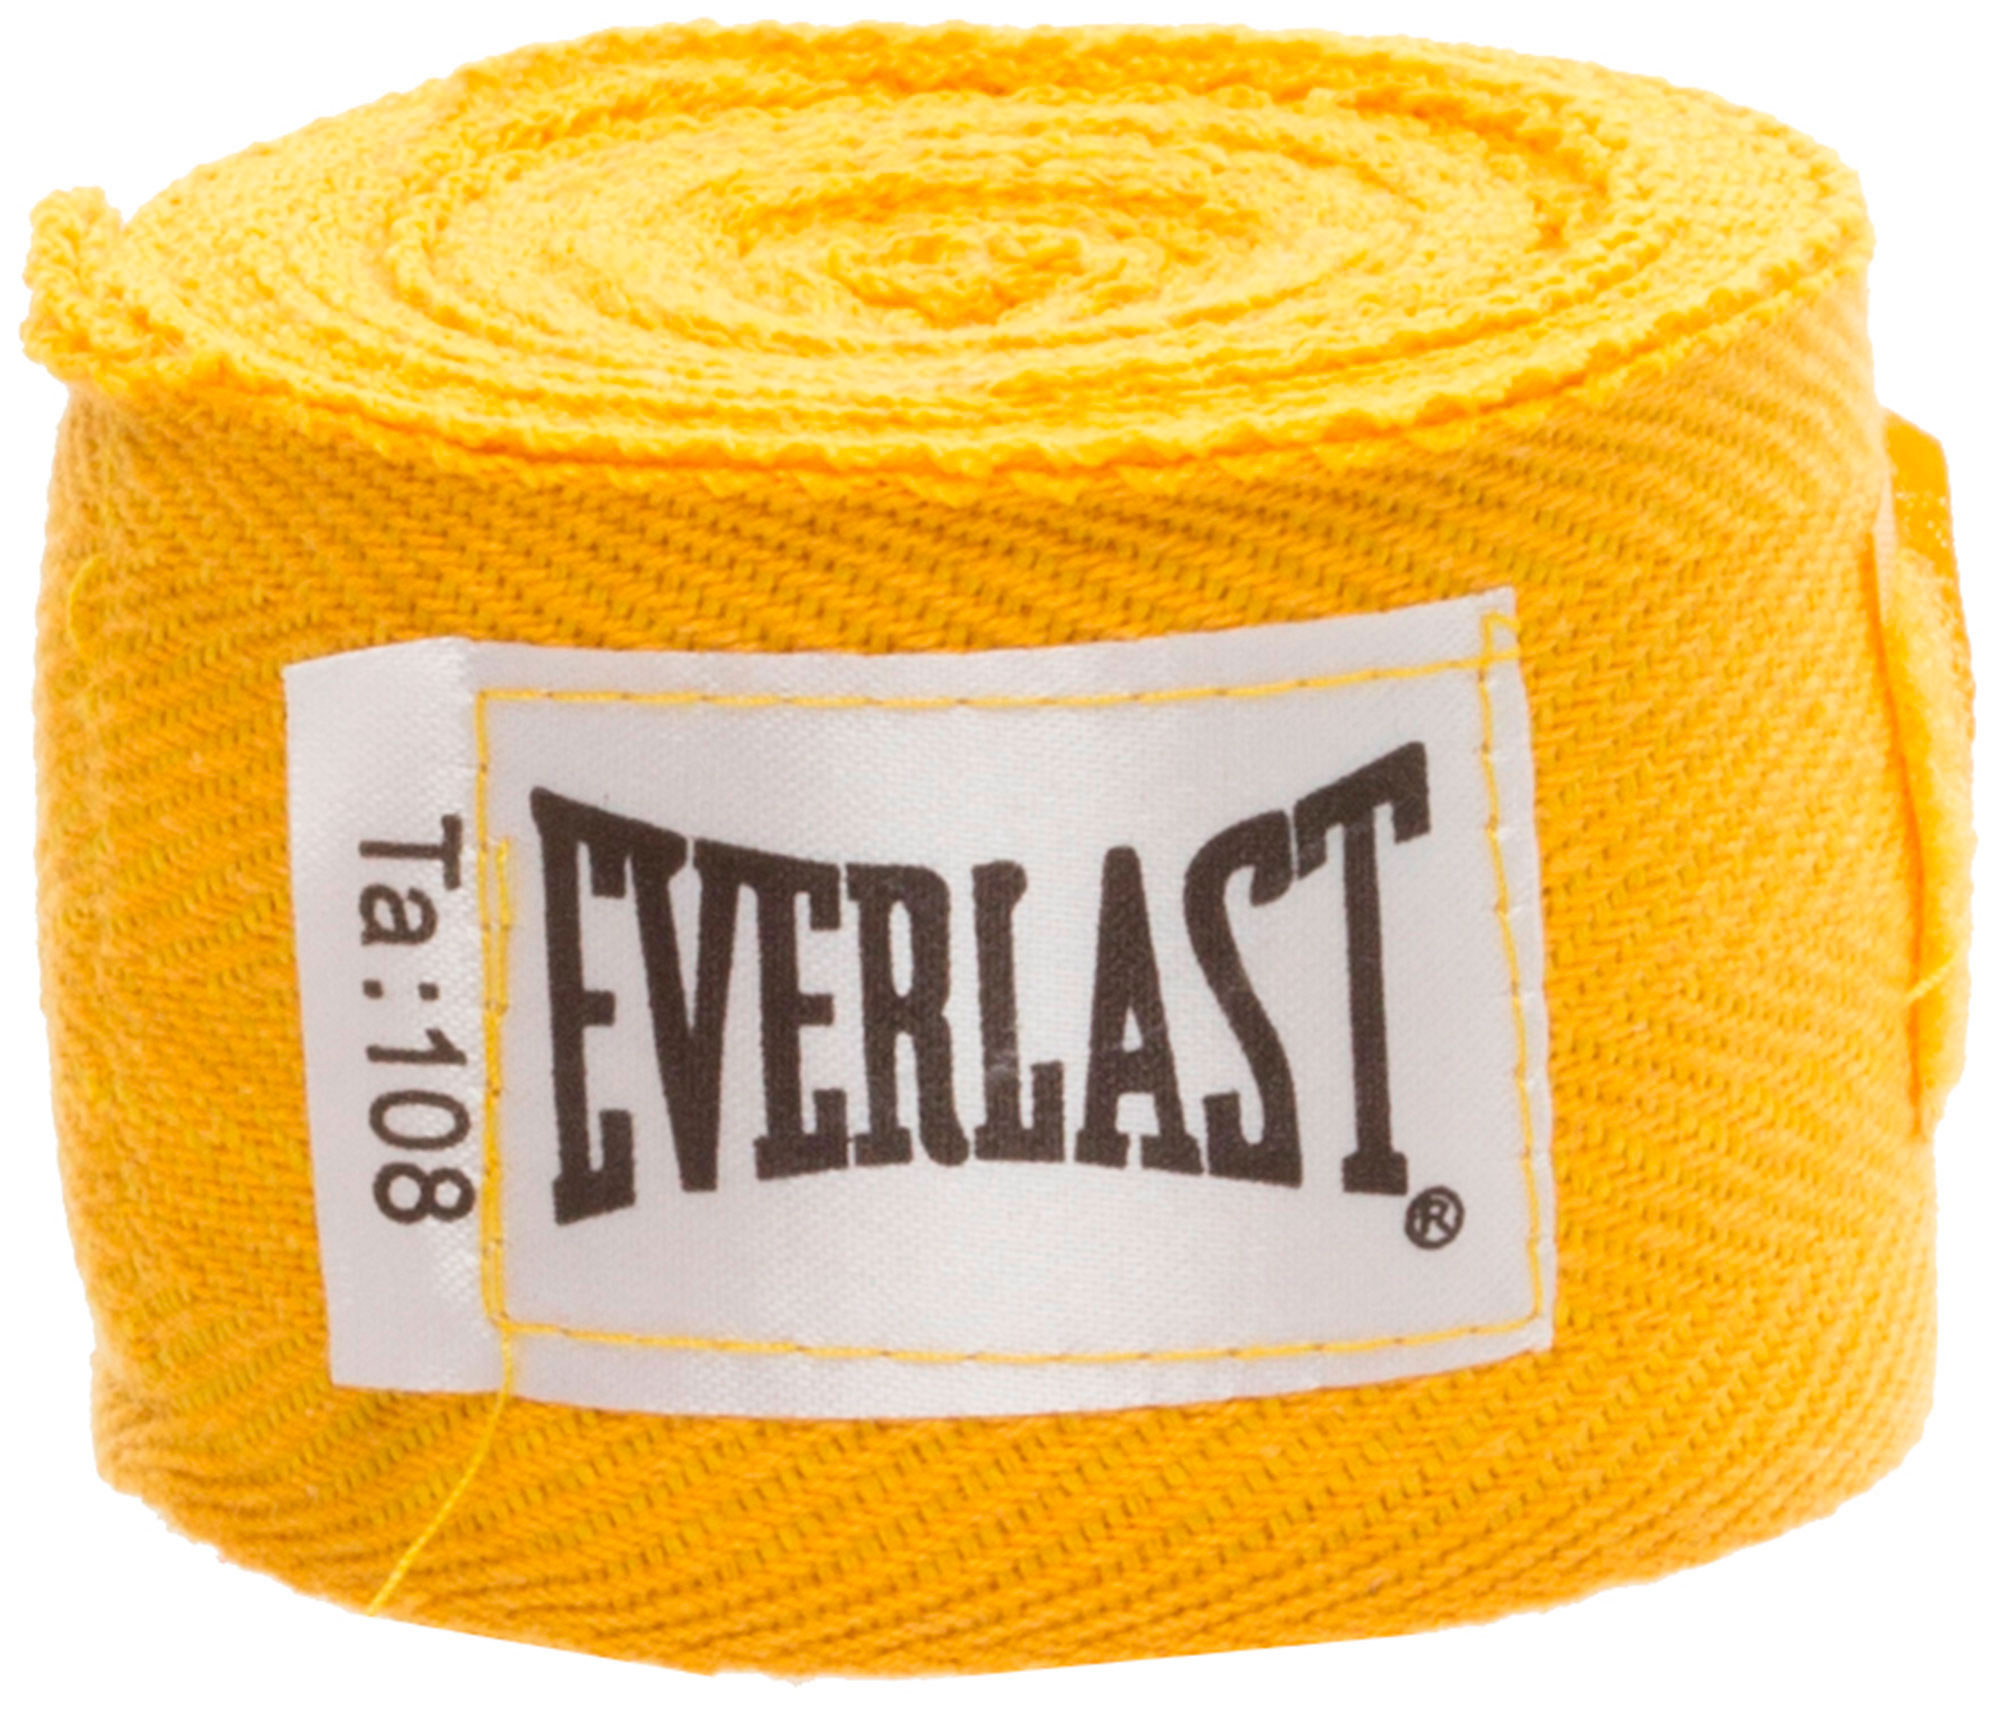 Everlast Бинт Everlast, 2,75 м, 2 шт., размер Без размера цена